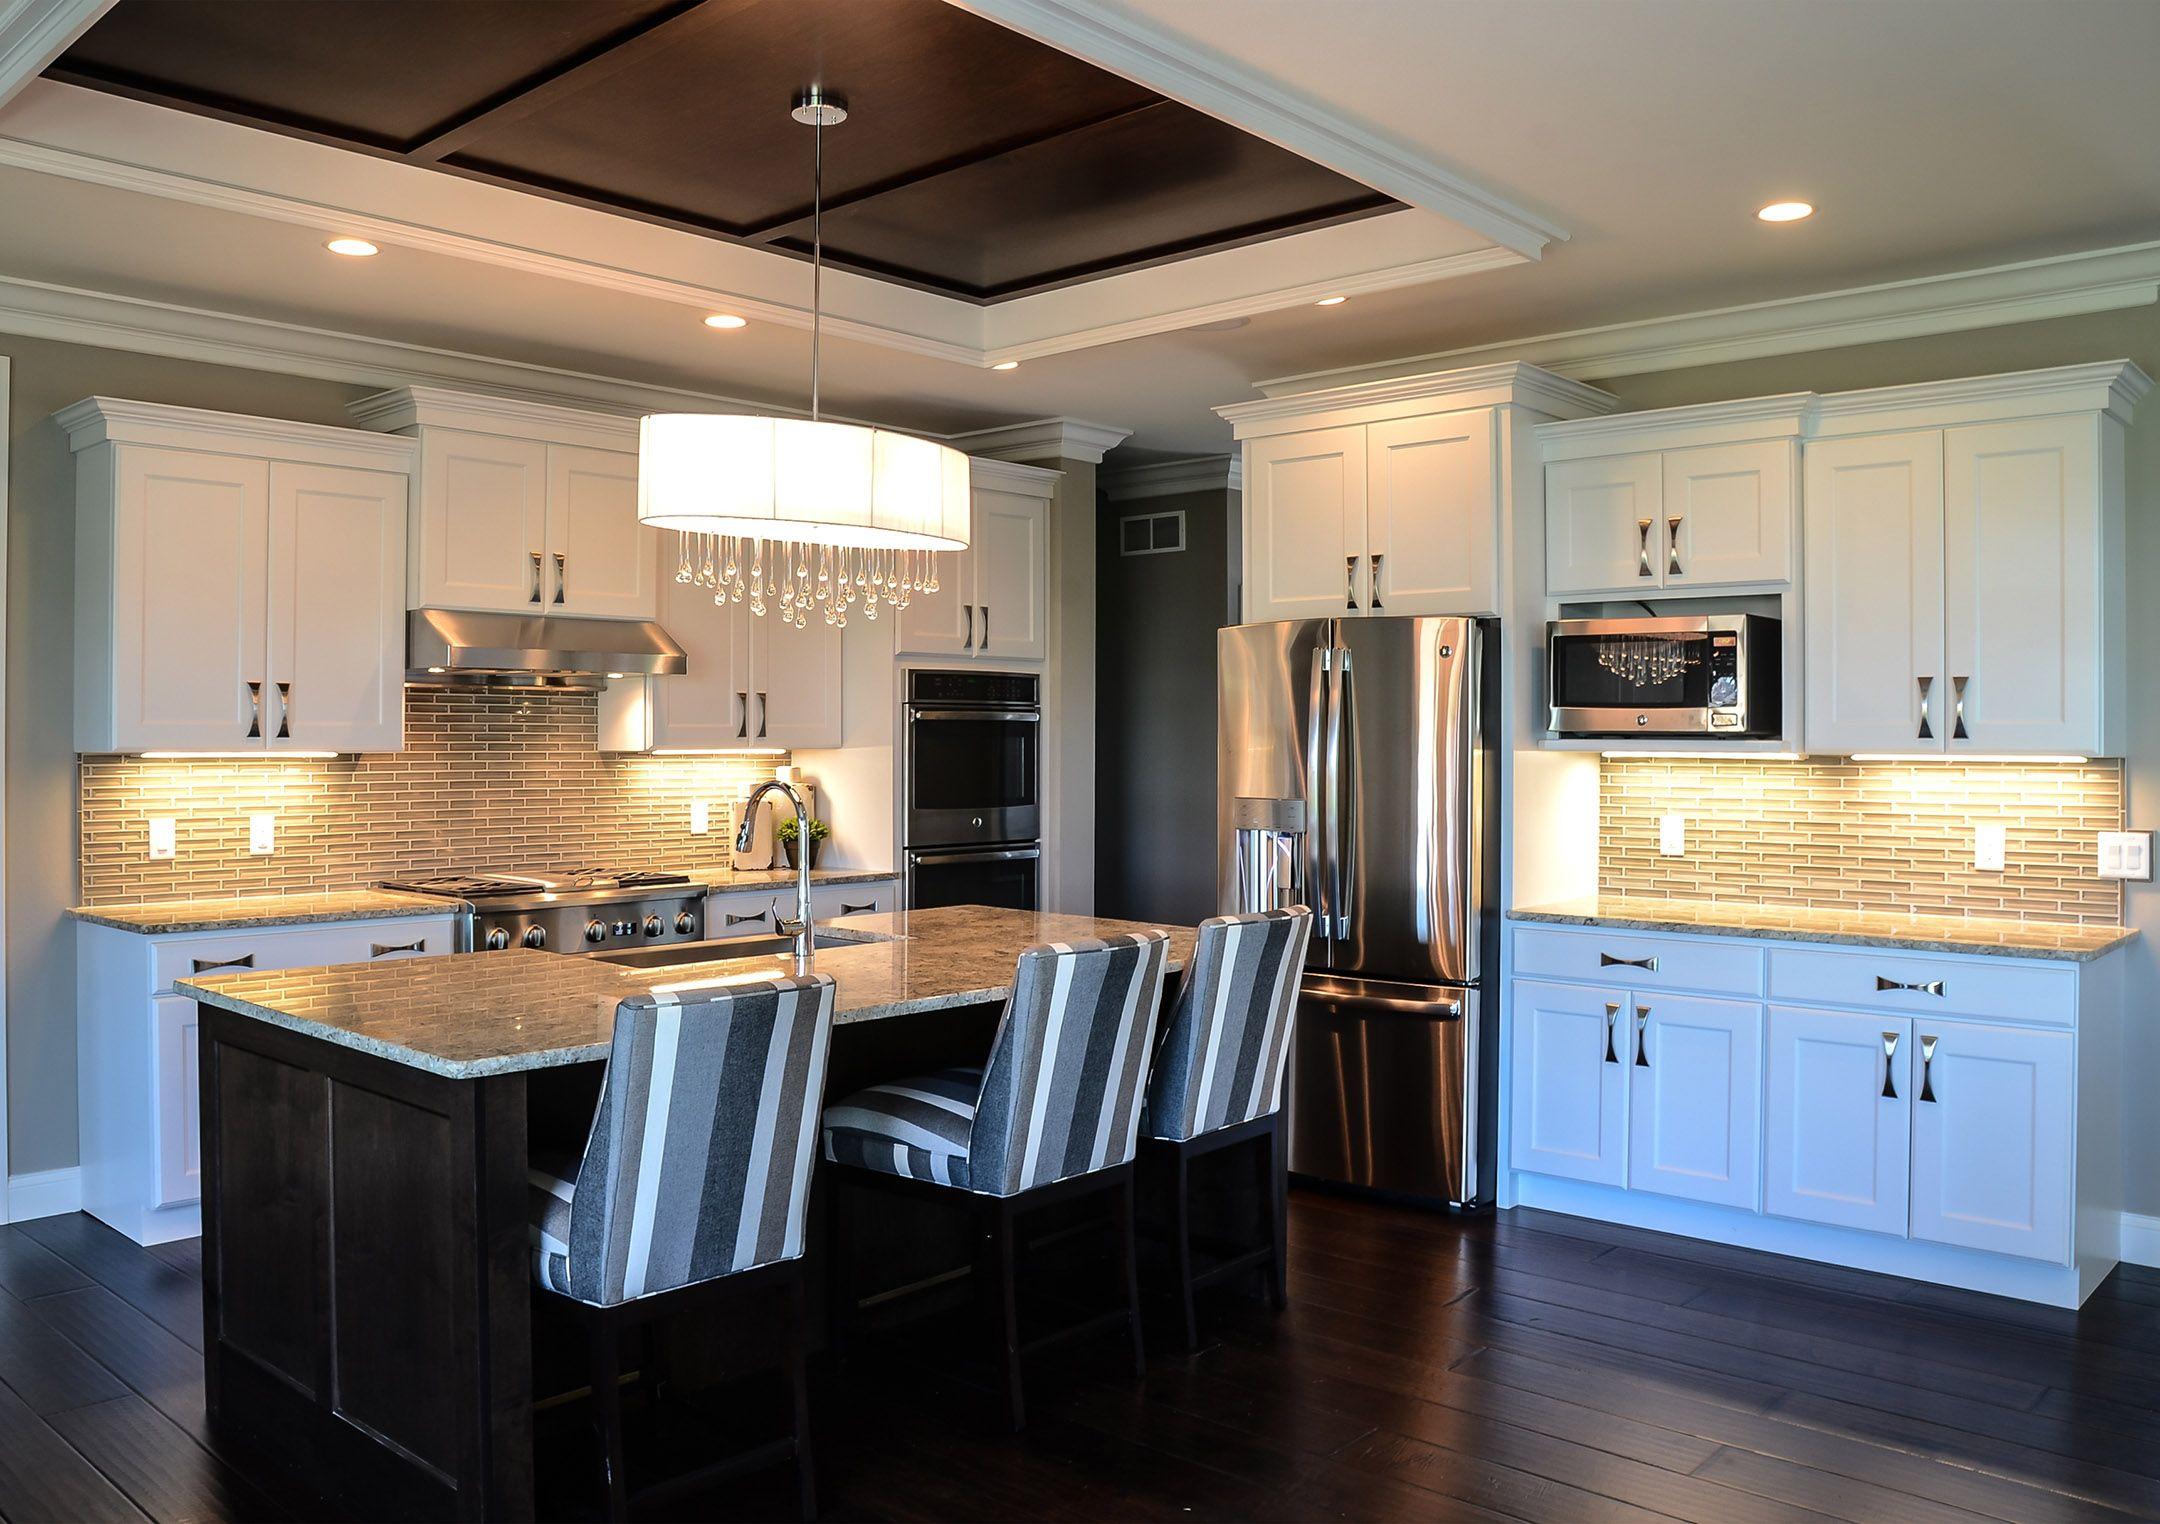 Photo Gallery Of Countryside Cabinets Kitchen Bathroom Bar Living Room Kitchen Cabinet Manufacturers Kitchen Kitchen Installation